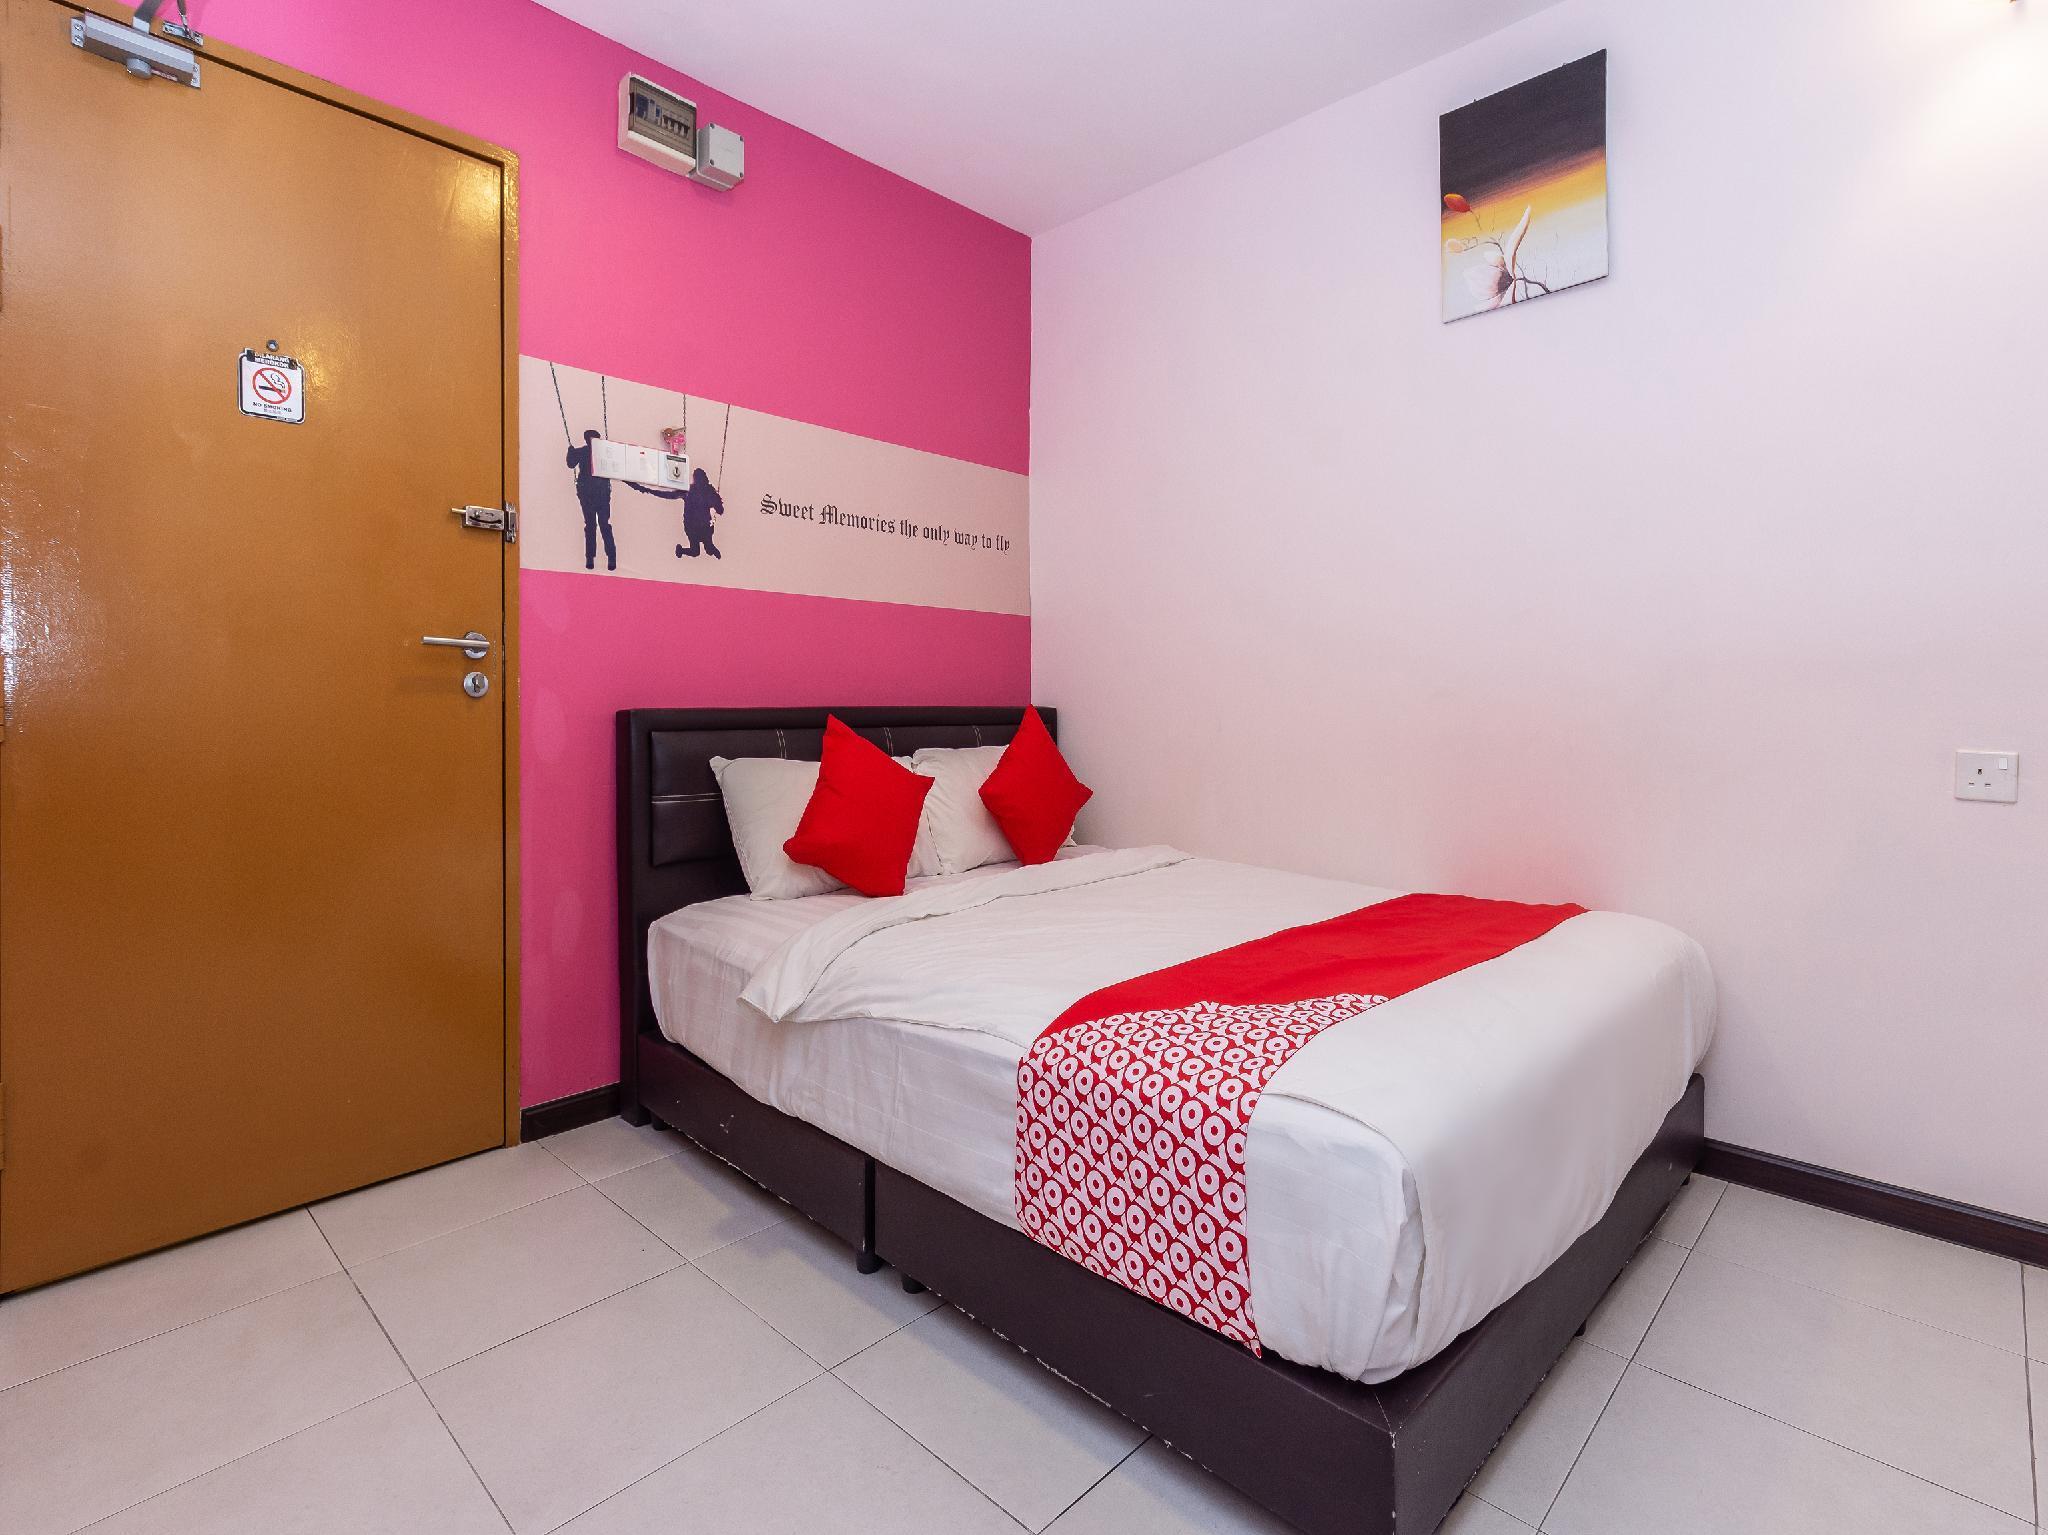 OYO 954 Sweet Memories Hotel